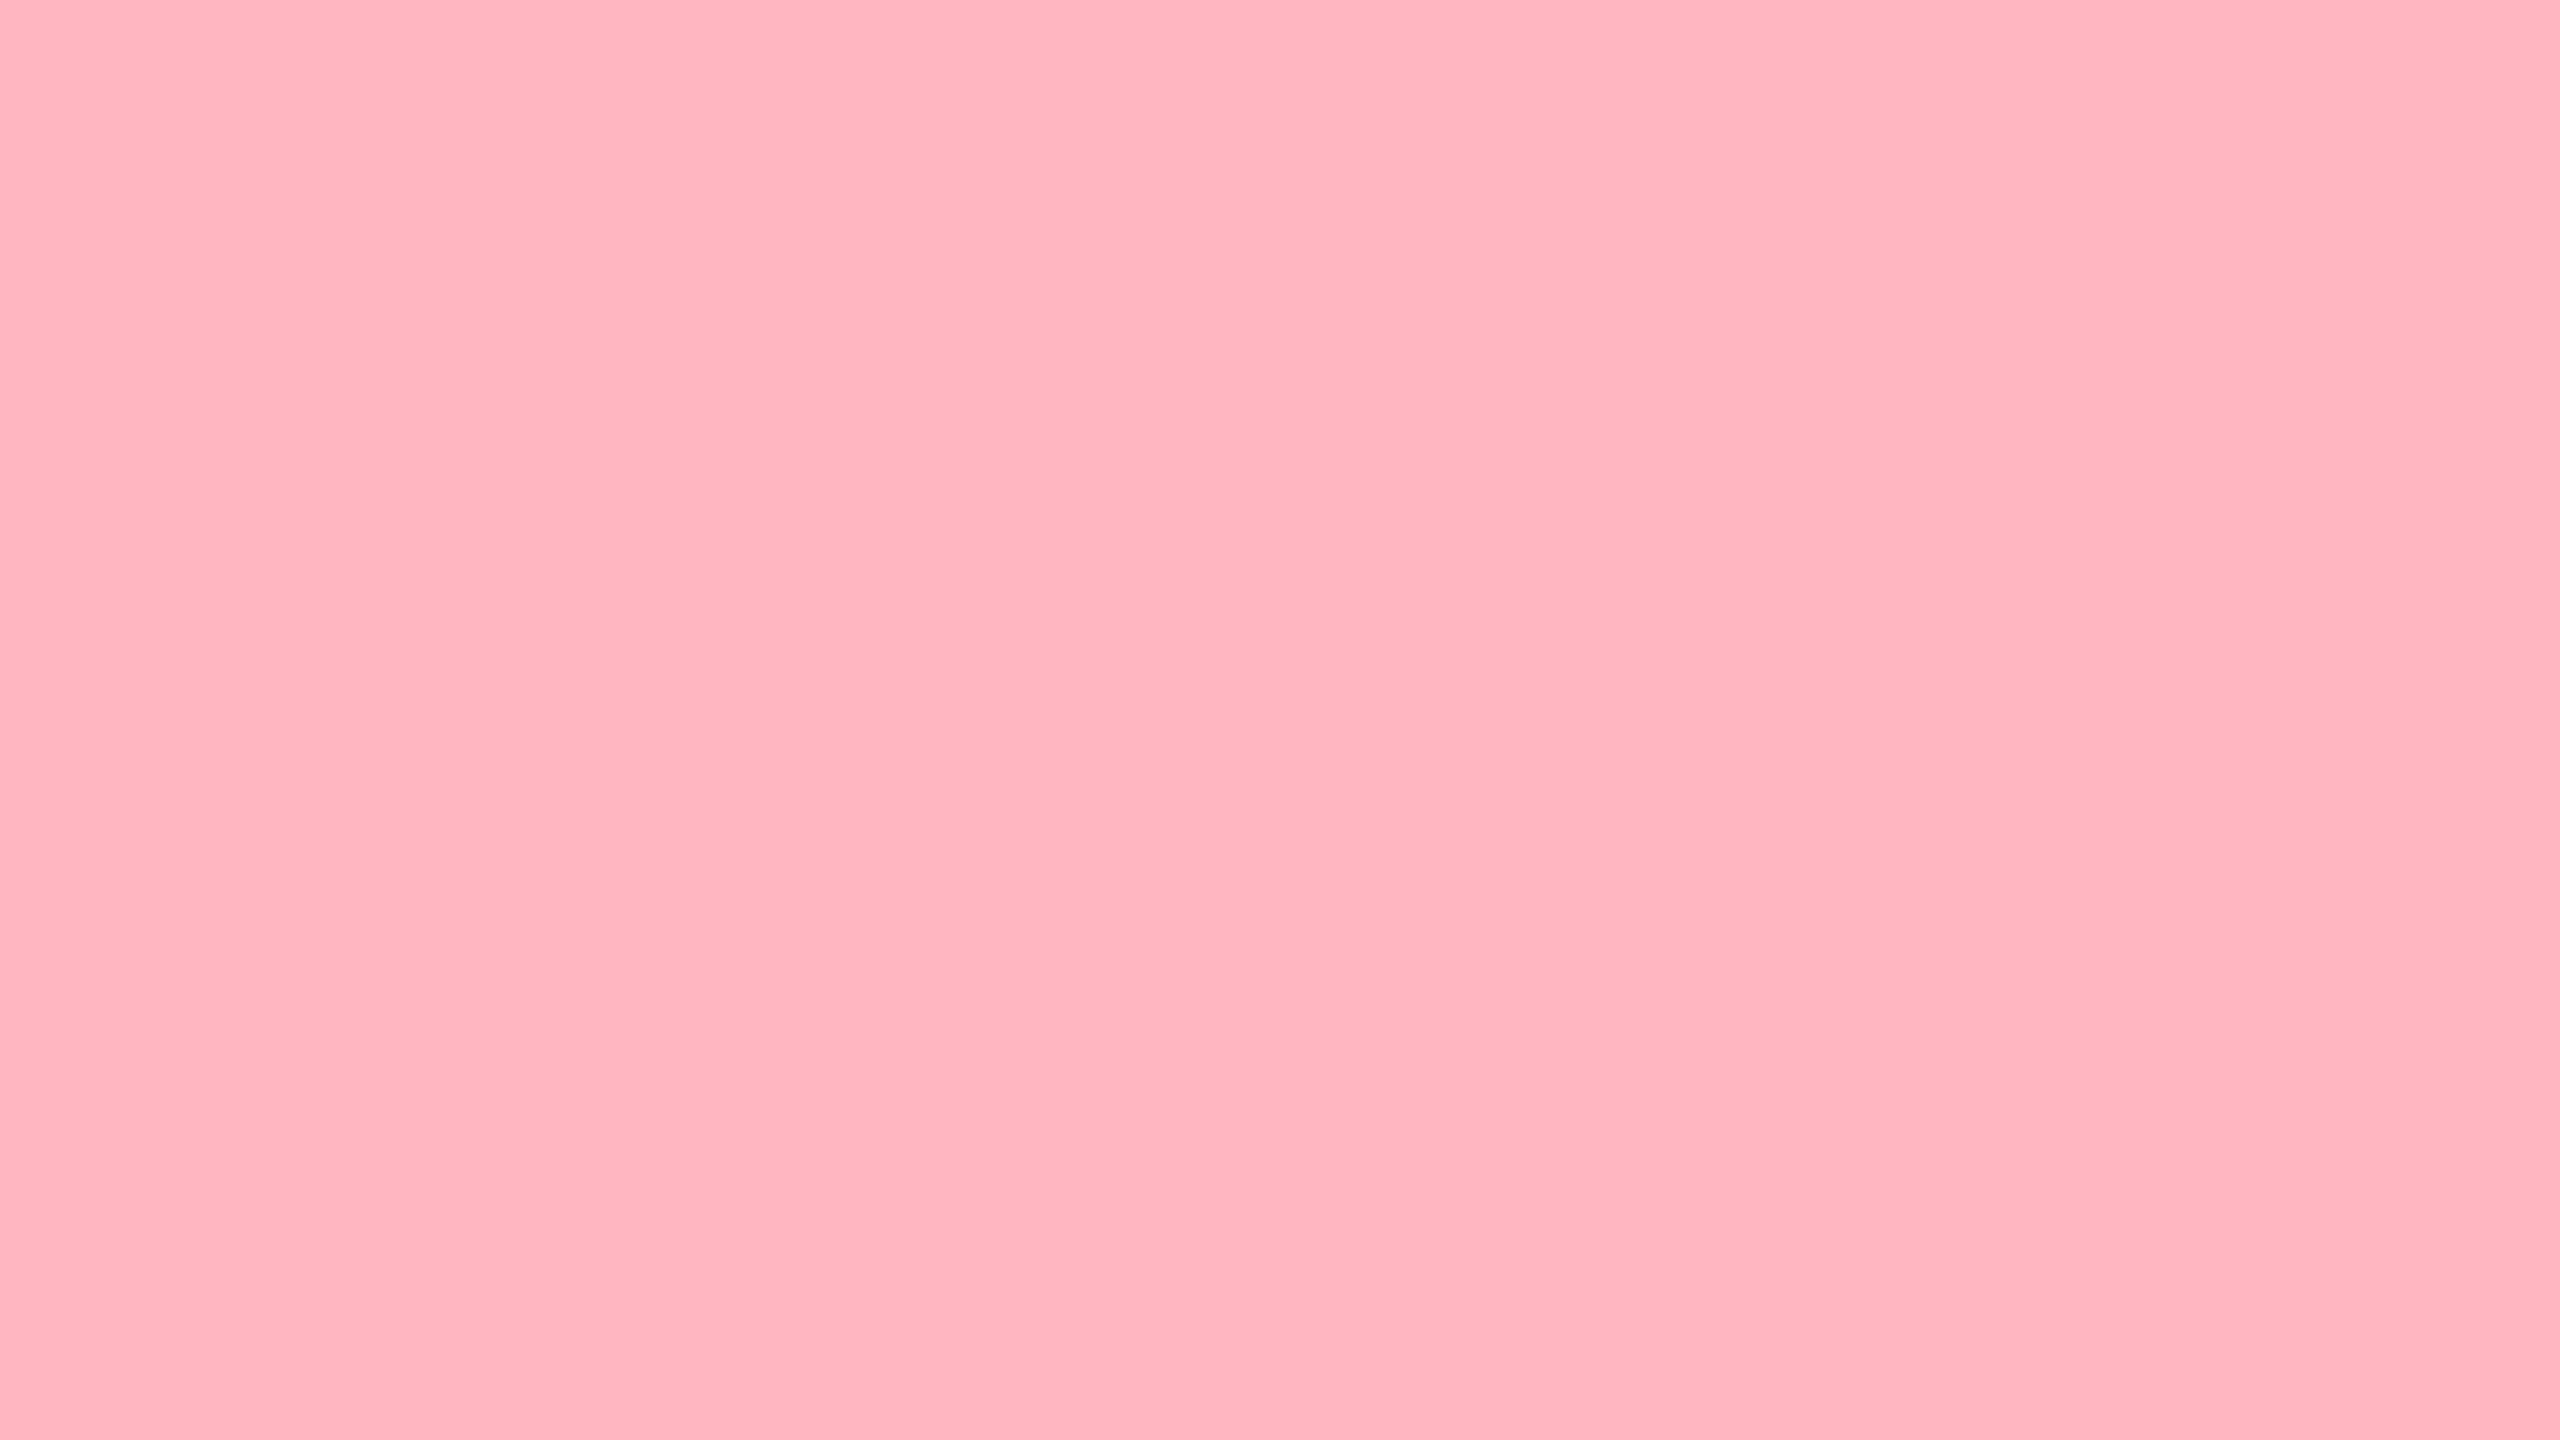 Light Pink Solid Color Wallpaper 973